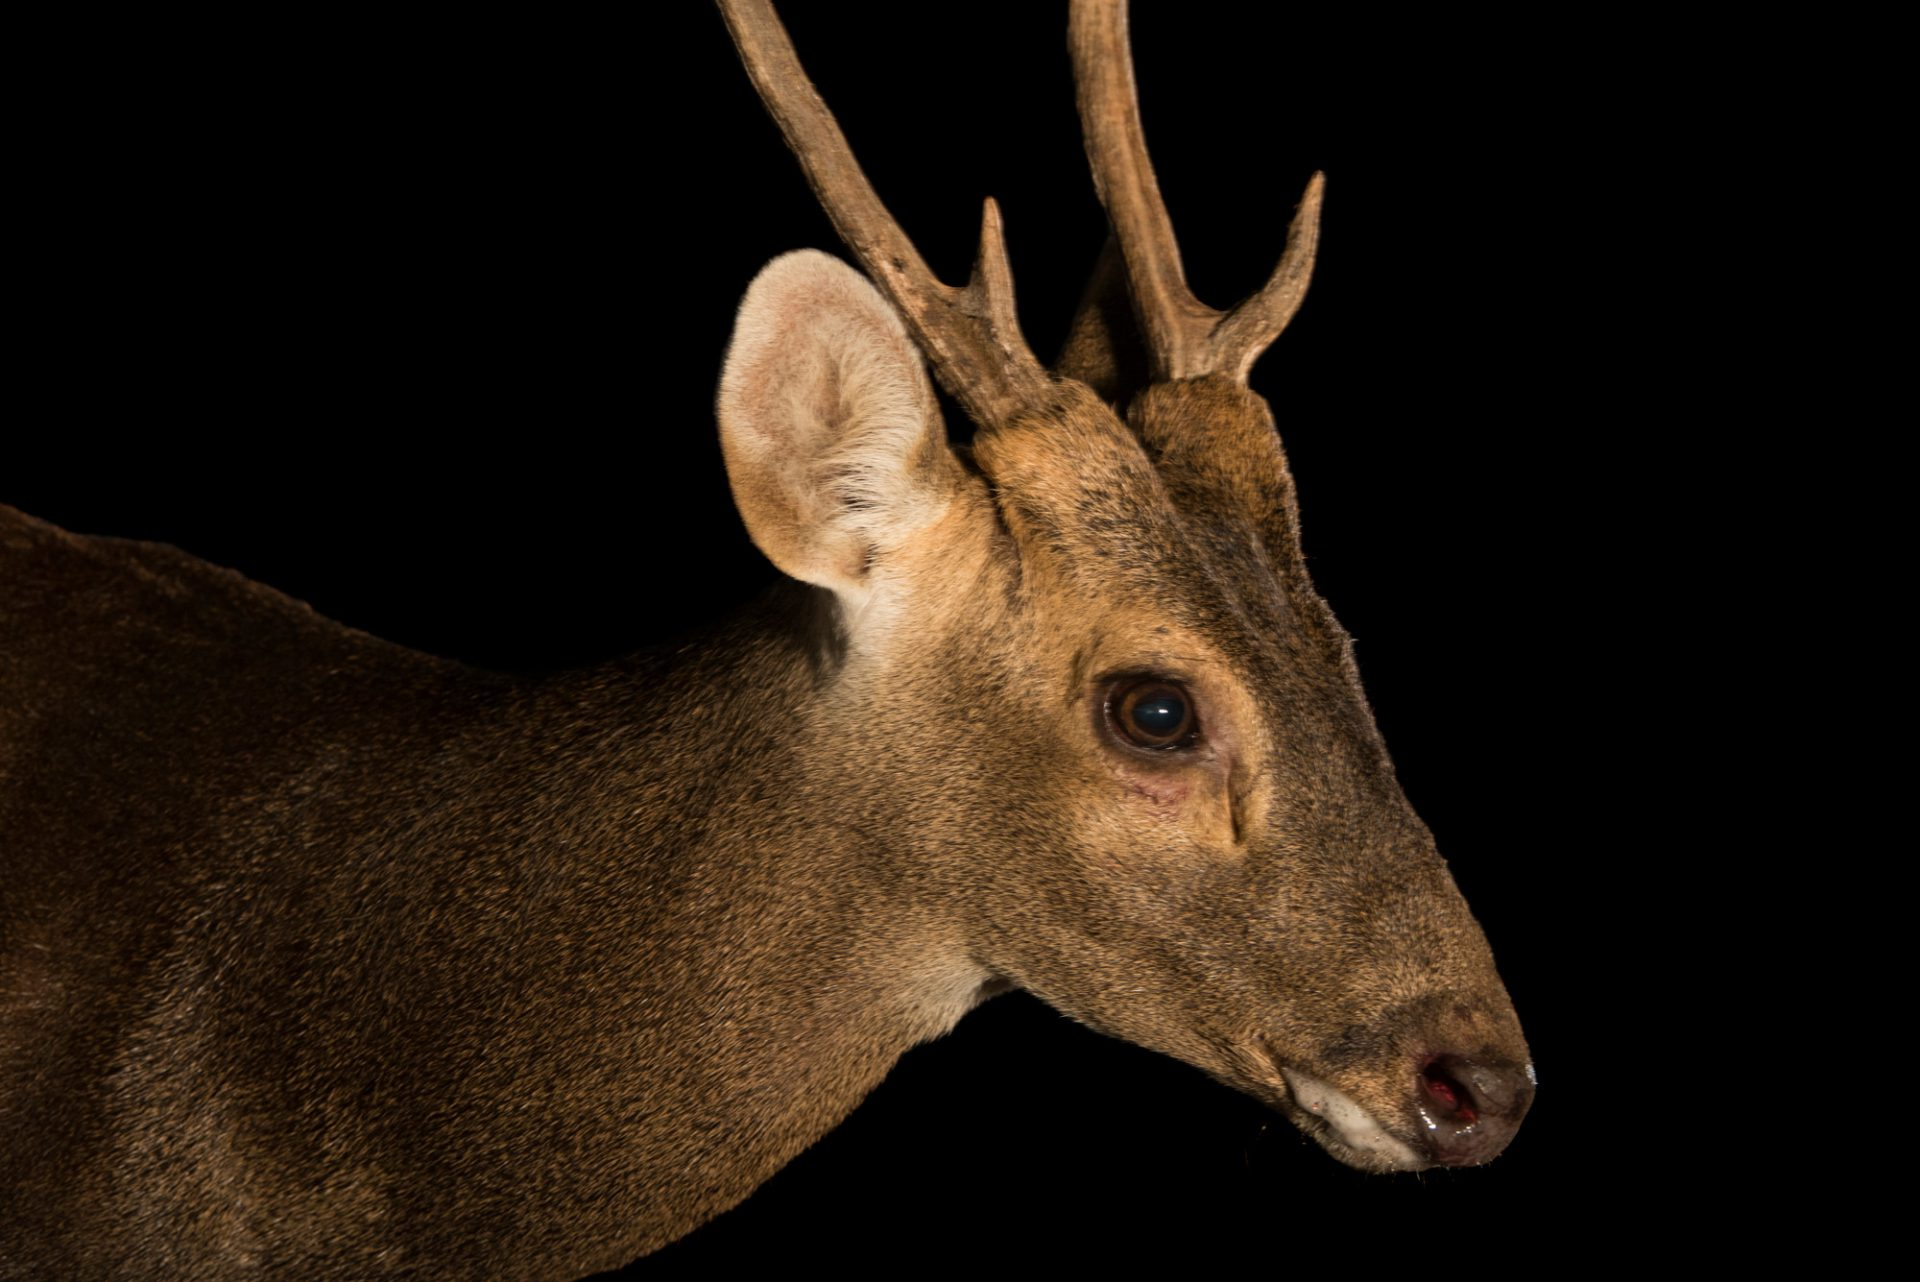 Photo: Critically endangered Bawean deer (Axis kuhlii) at Taiping Zoo.